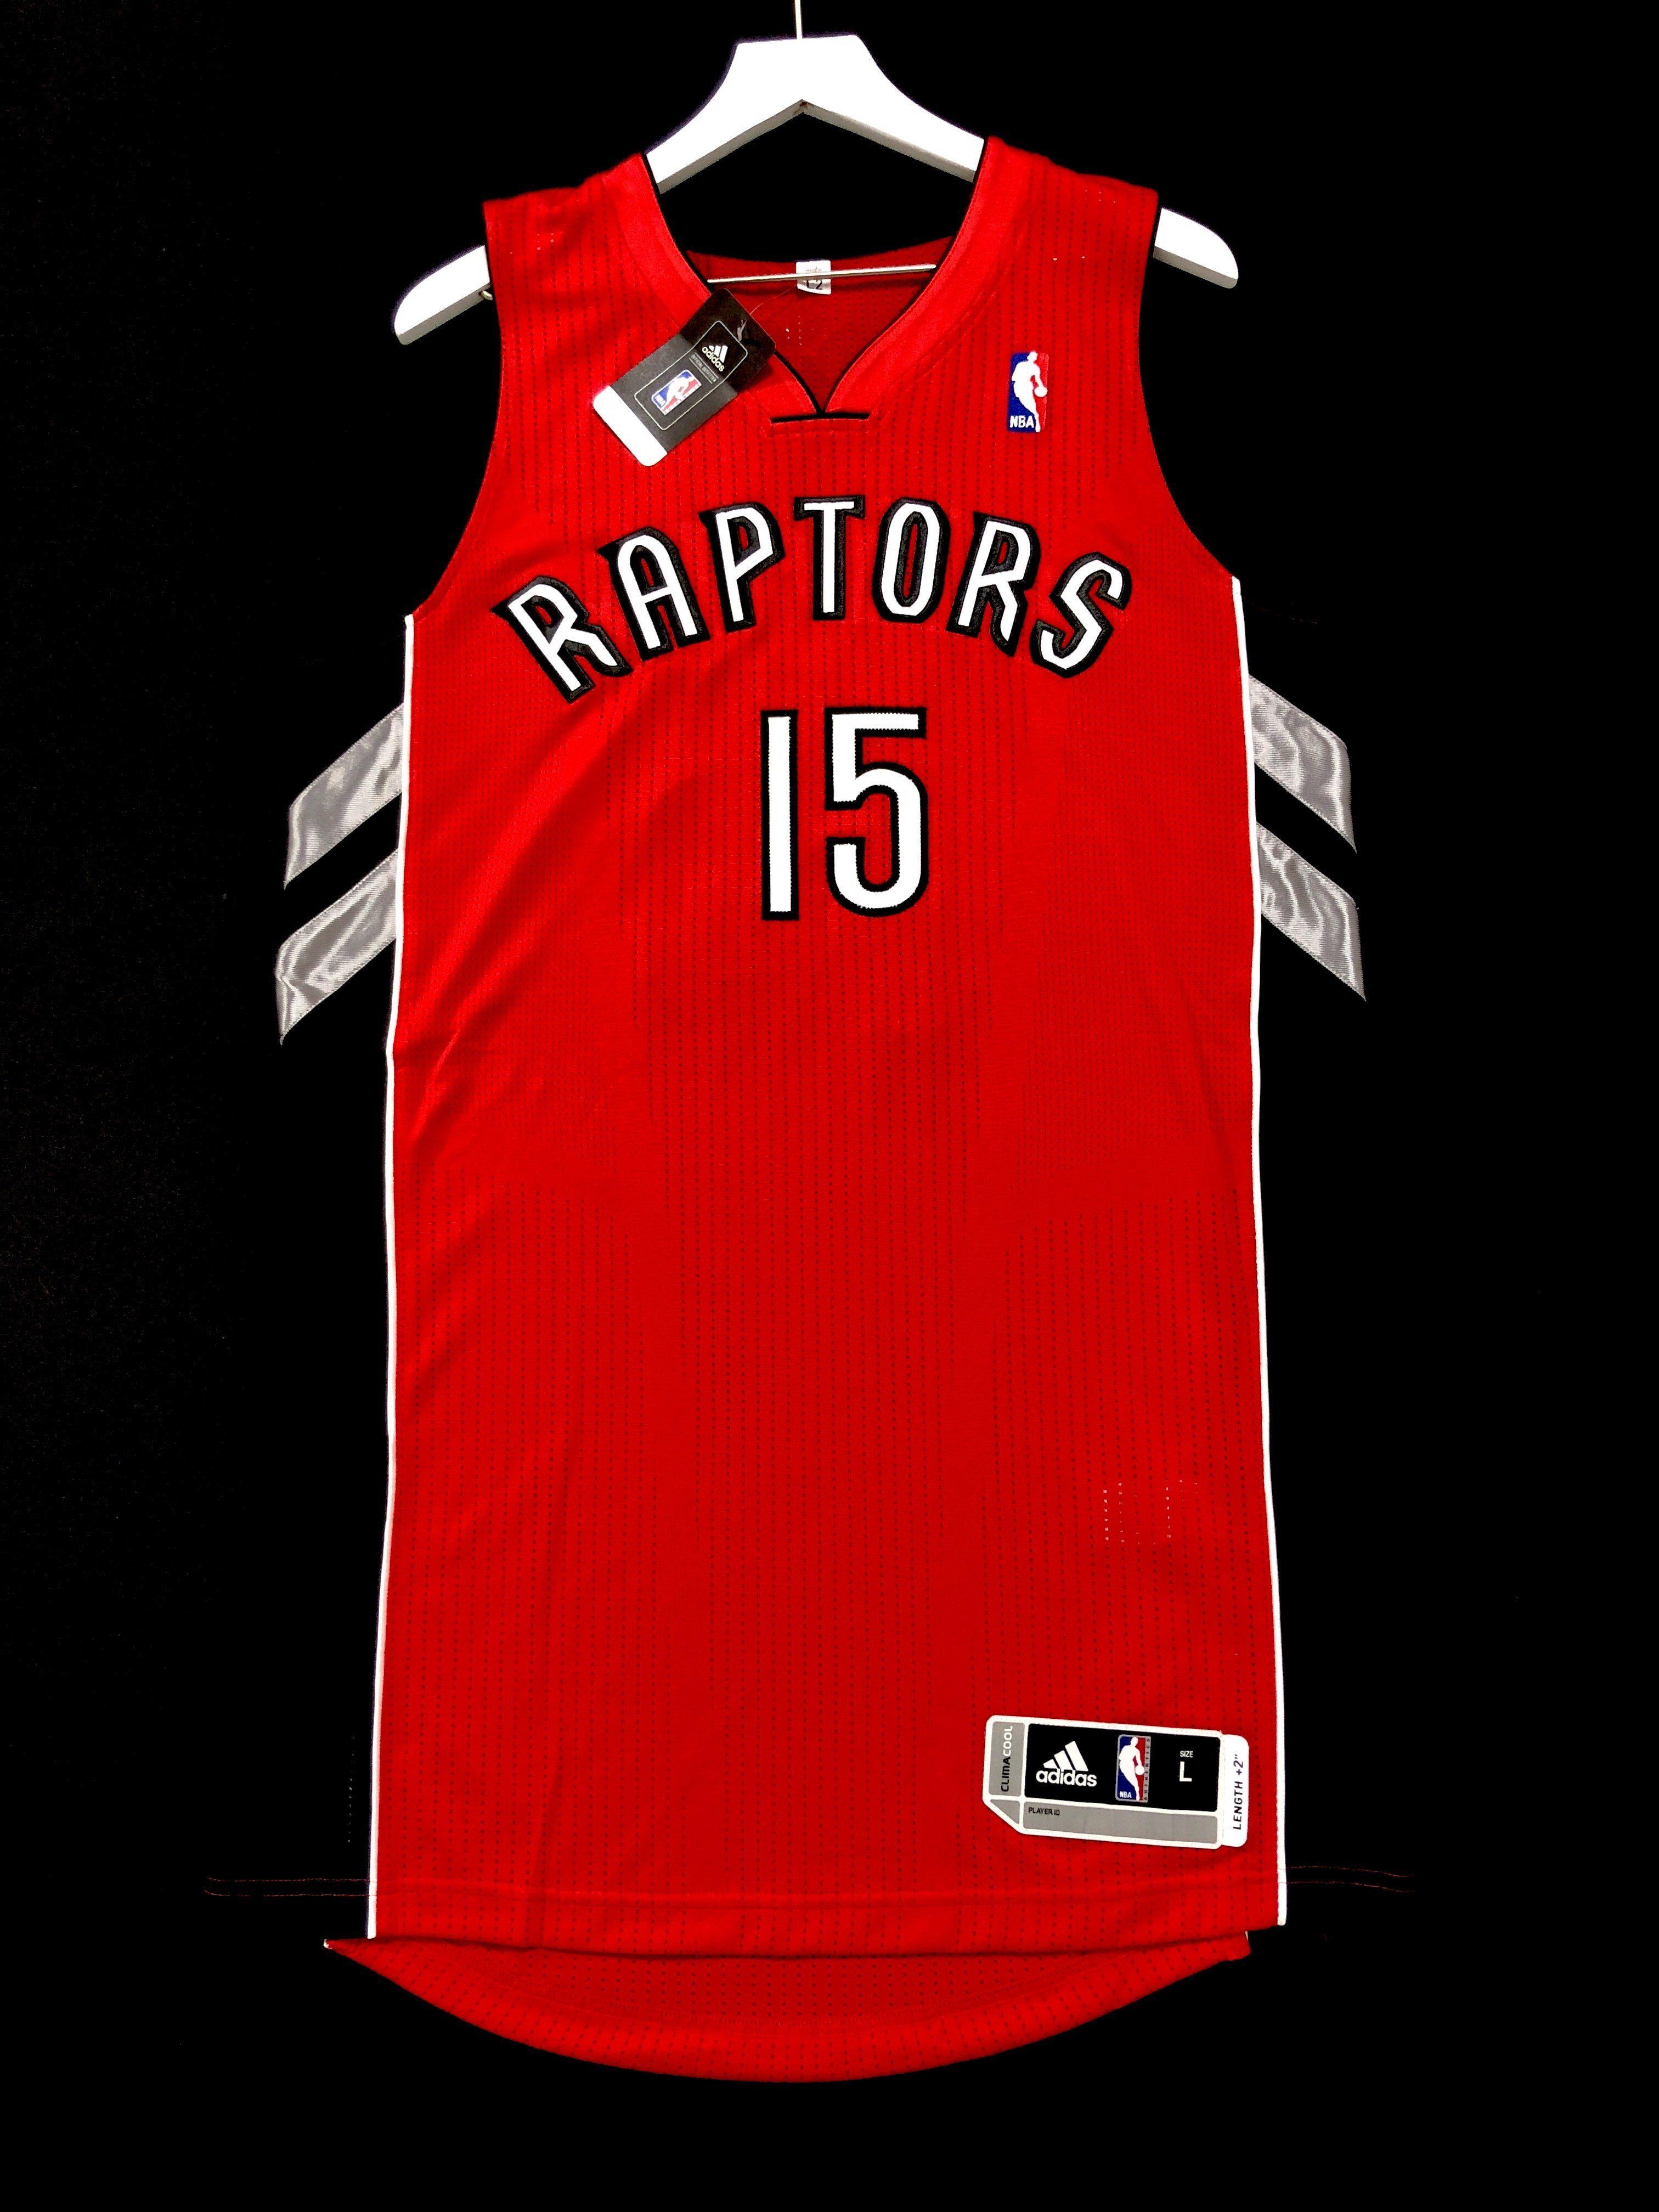 cheaper c8267 f9980 Vince Carter Toronto Raptors Pro Cut Adidas NBA Jersey ...